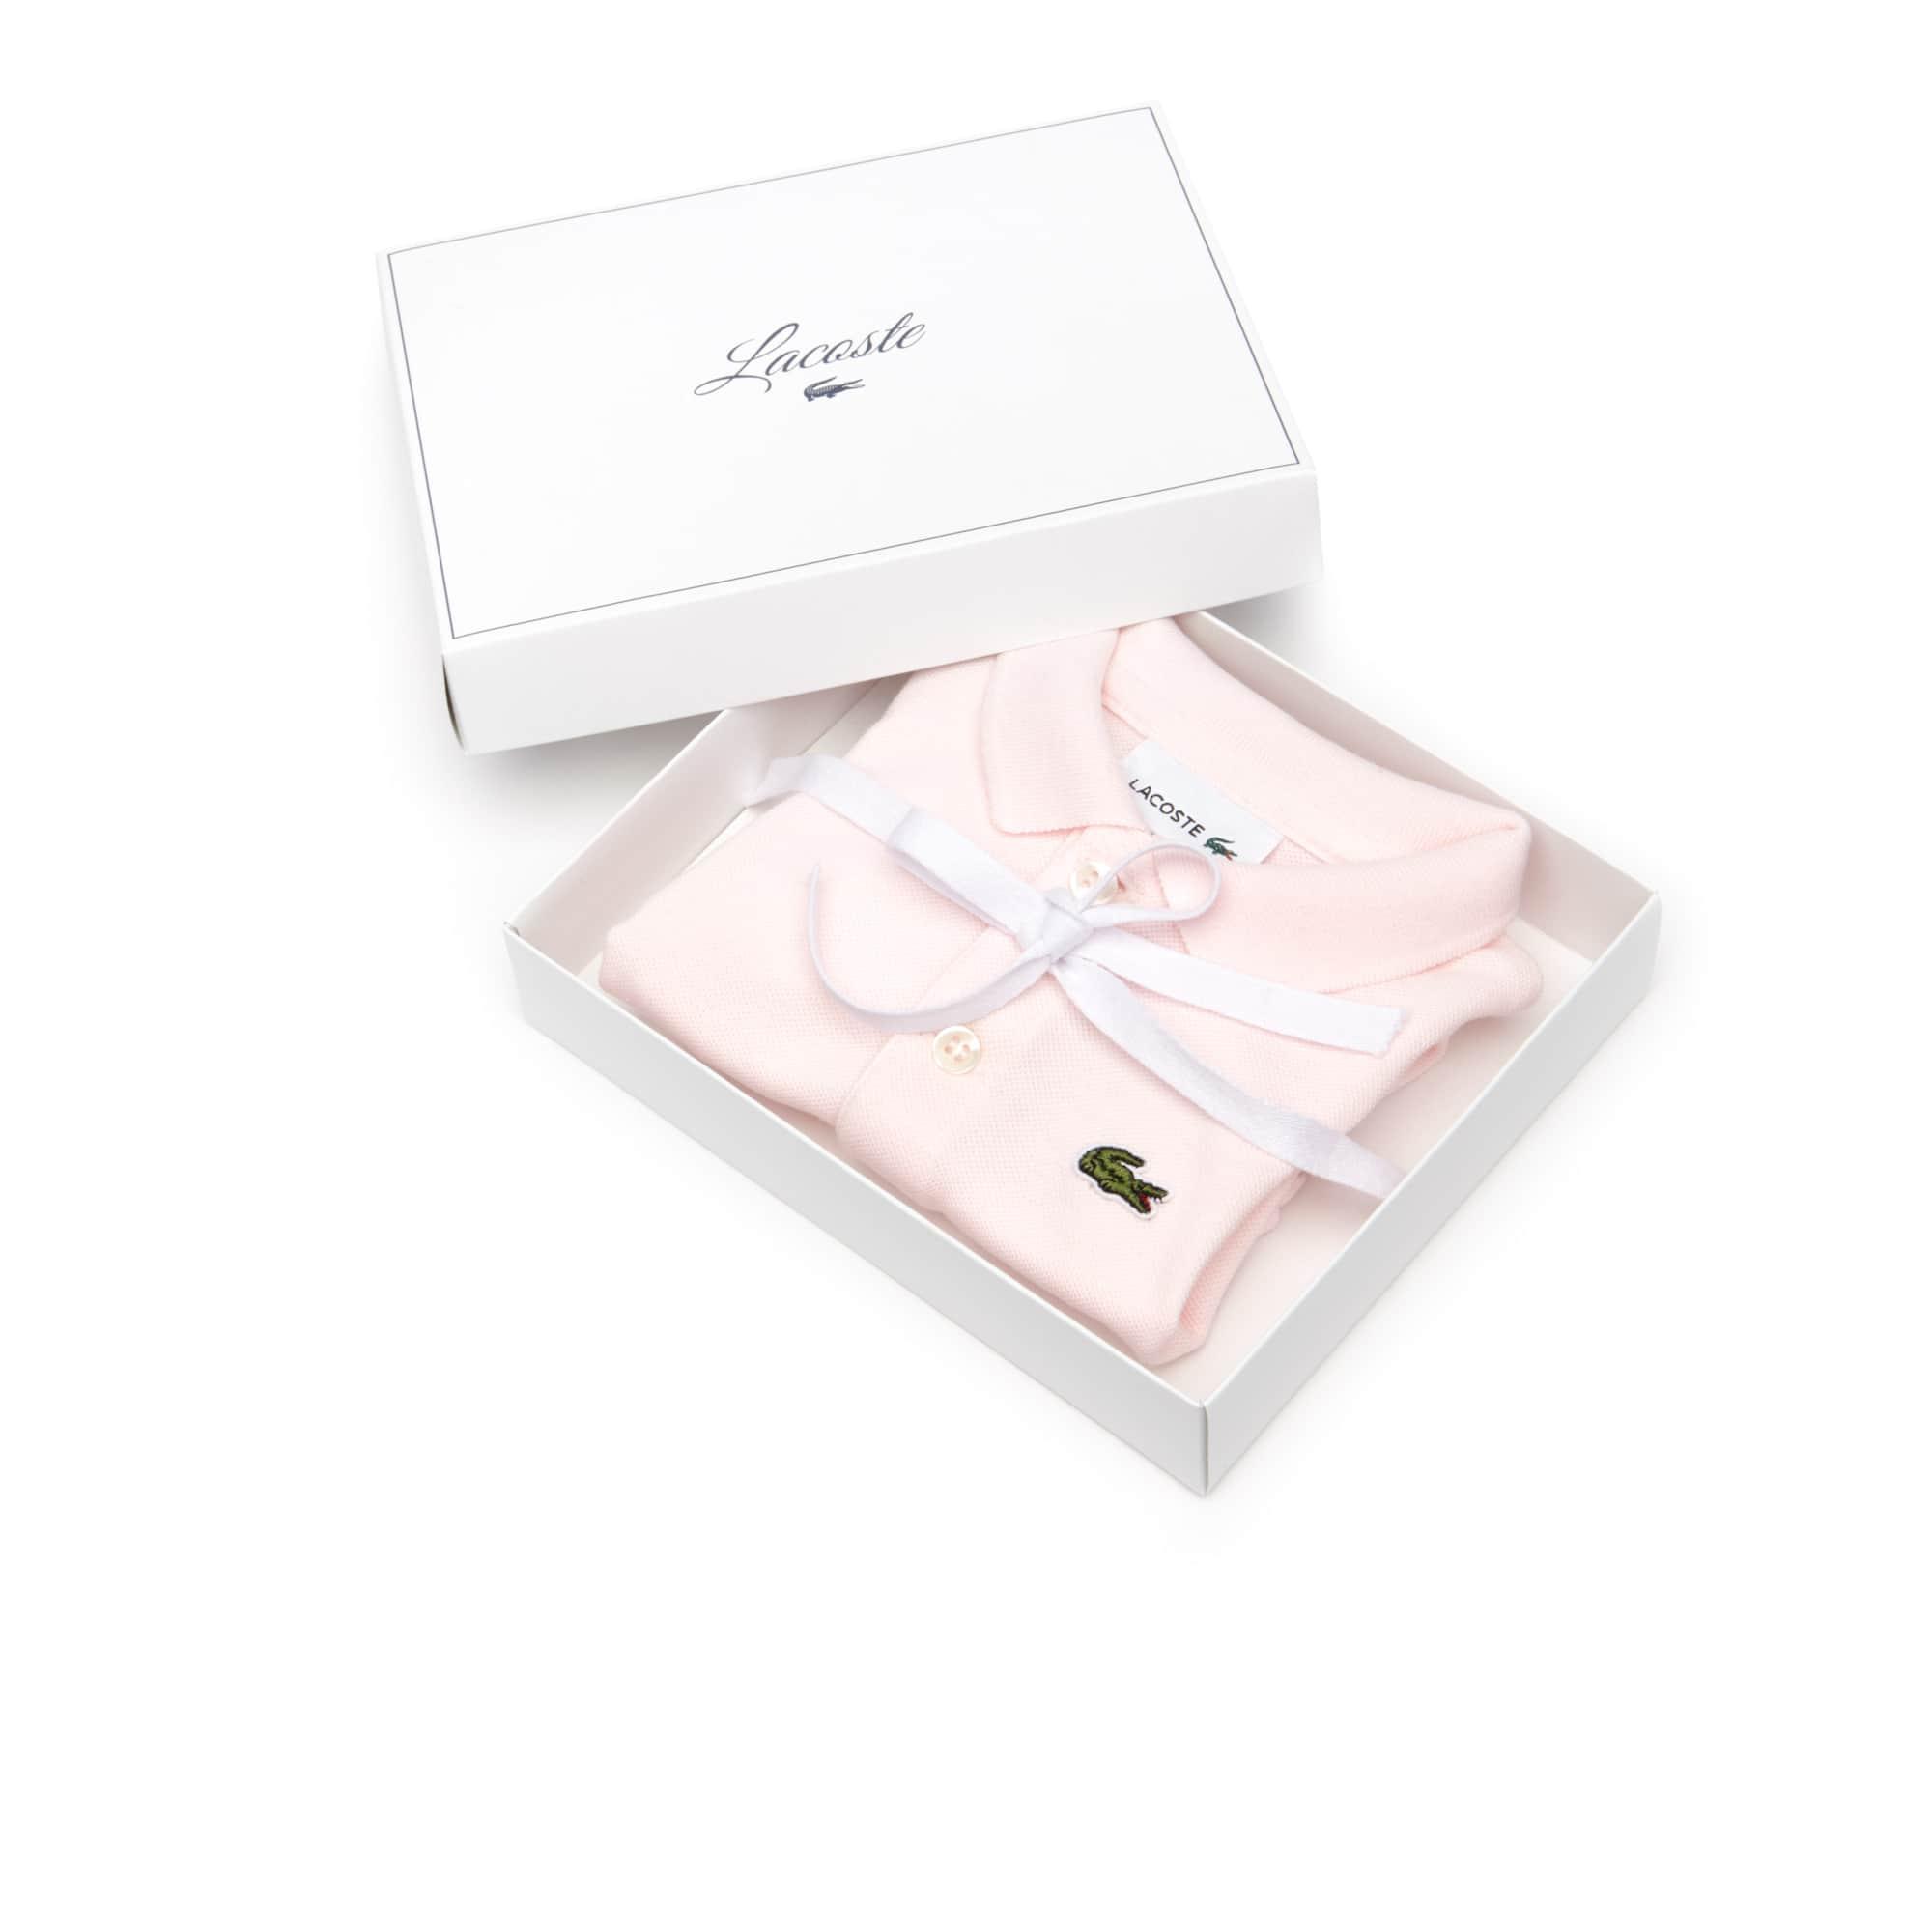 Jungen-Geschenkset Body aus Stretch-Baumwoll-Piqué